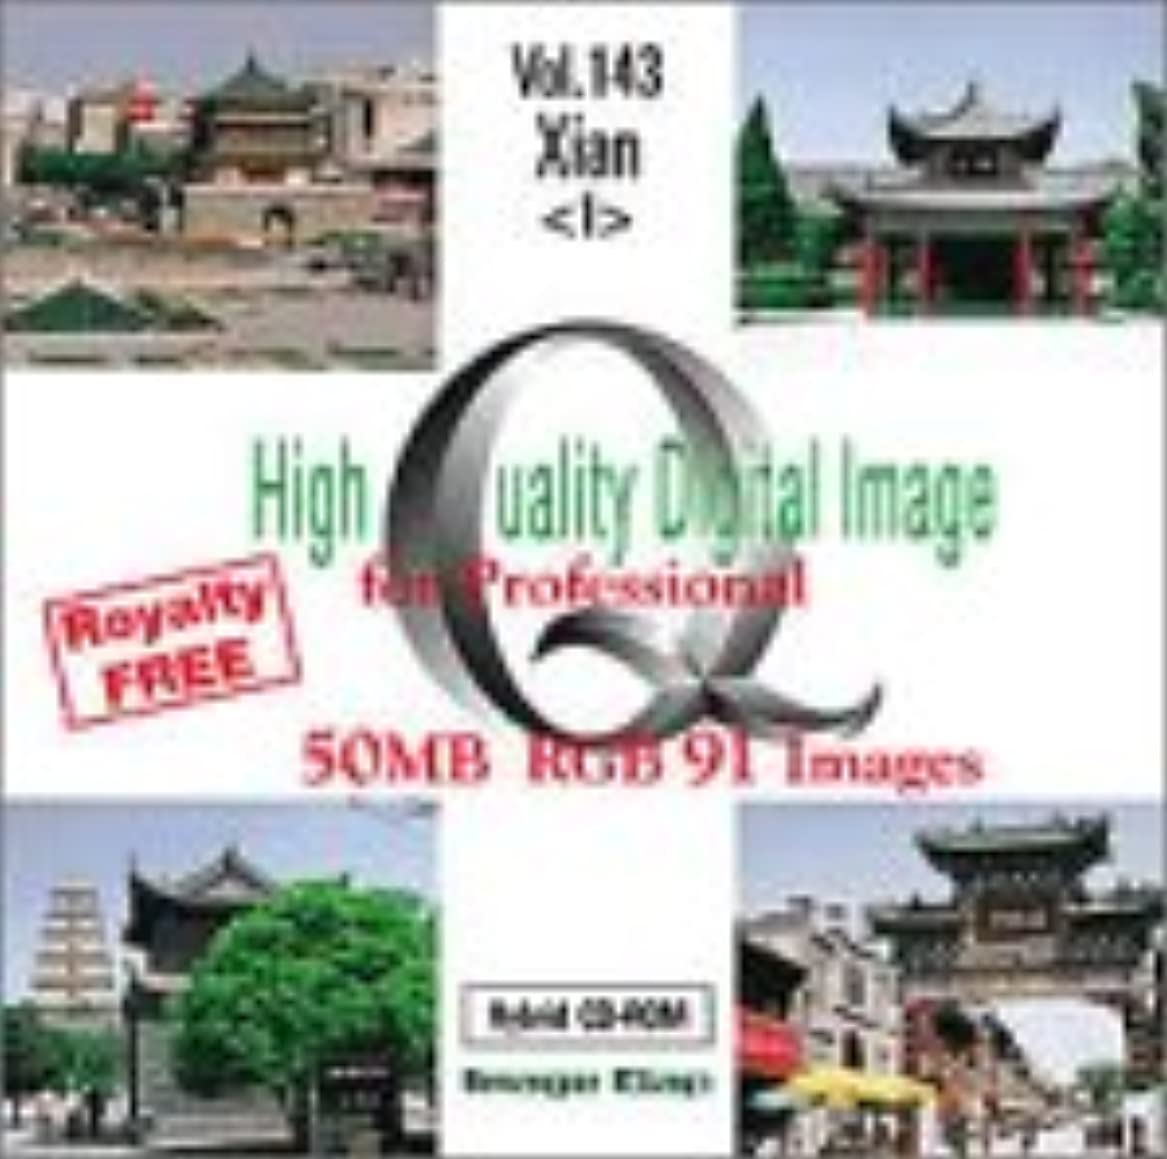 High Quality Digital Image 西安 <1> <中国>